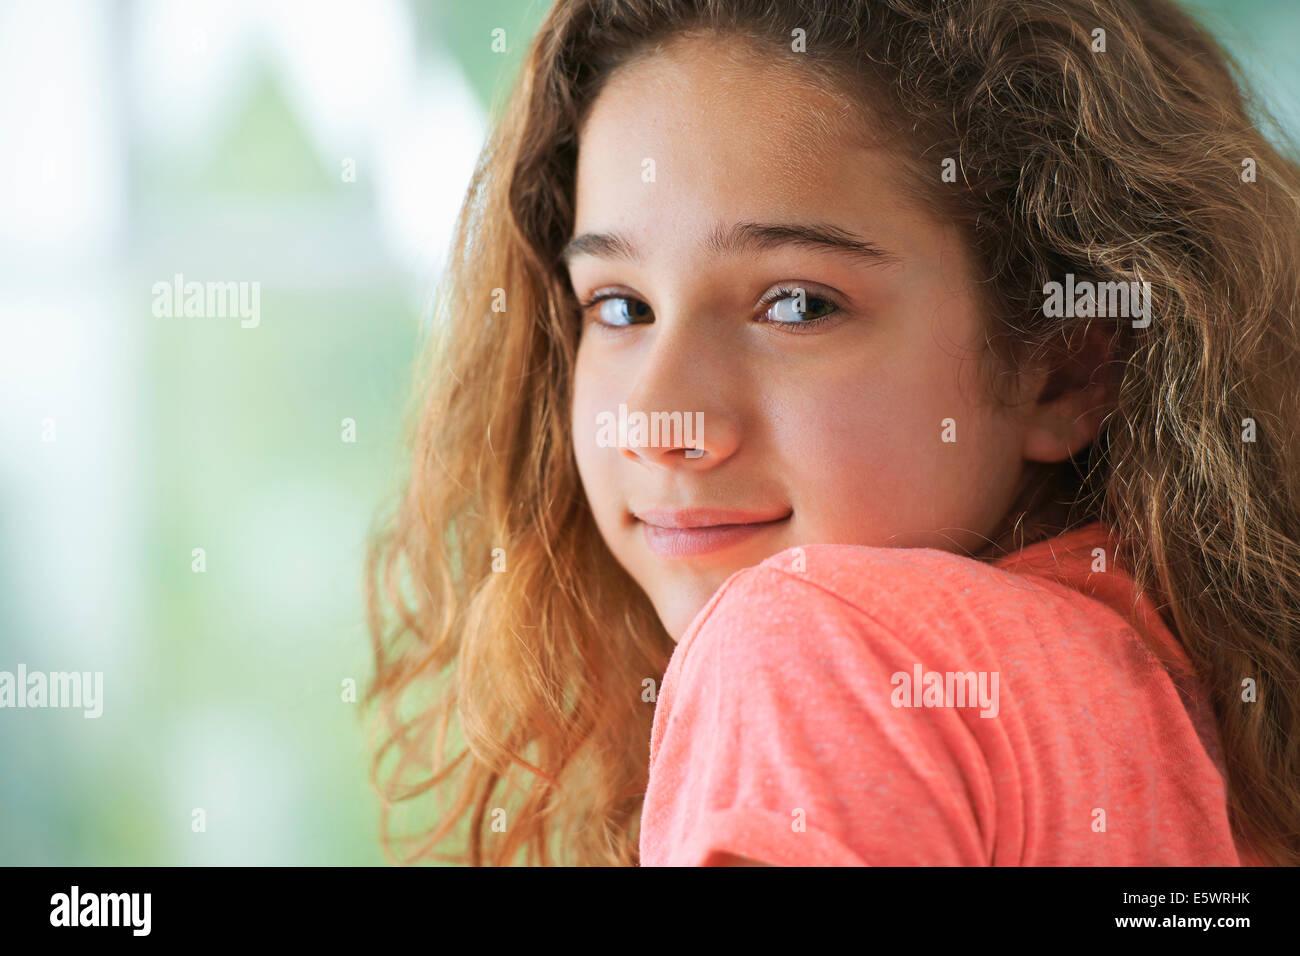 Muchacha con pelo castaño ,sonriendo, Retrato Imagen De Stock